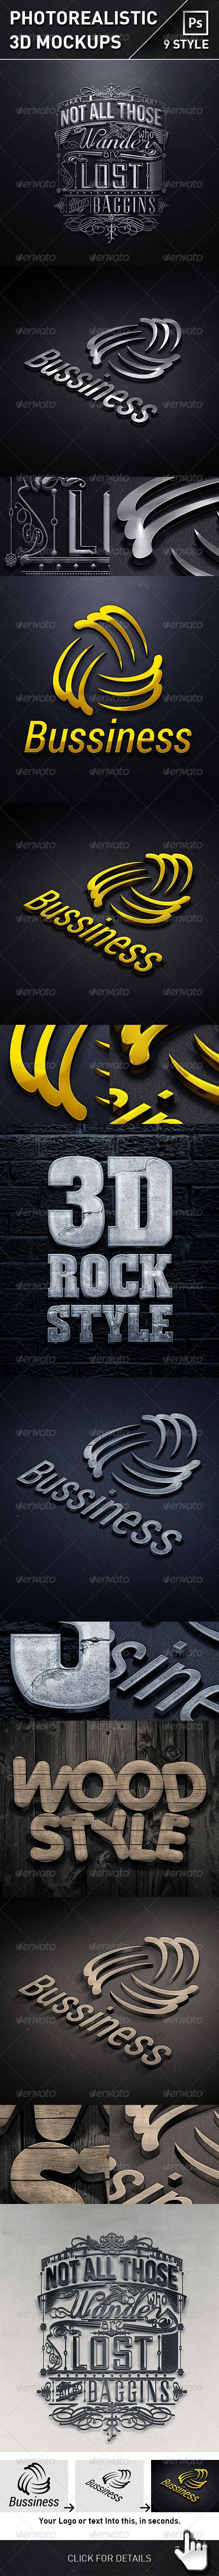 Photorealistic 3D Logo Mockups - Product Mock-Ups Graphics